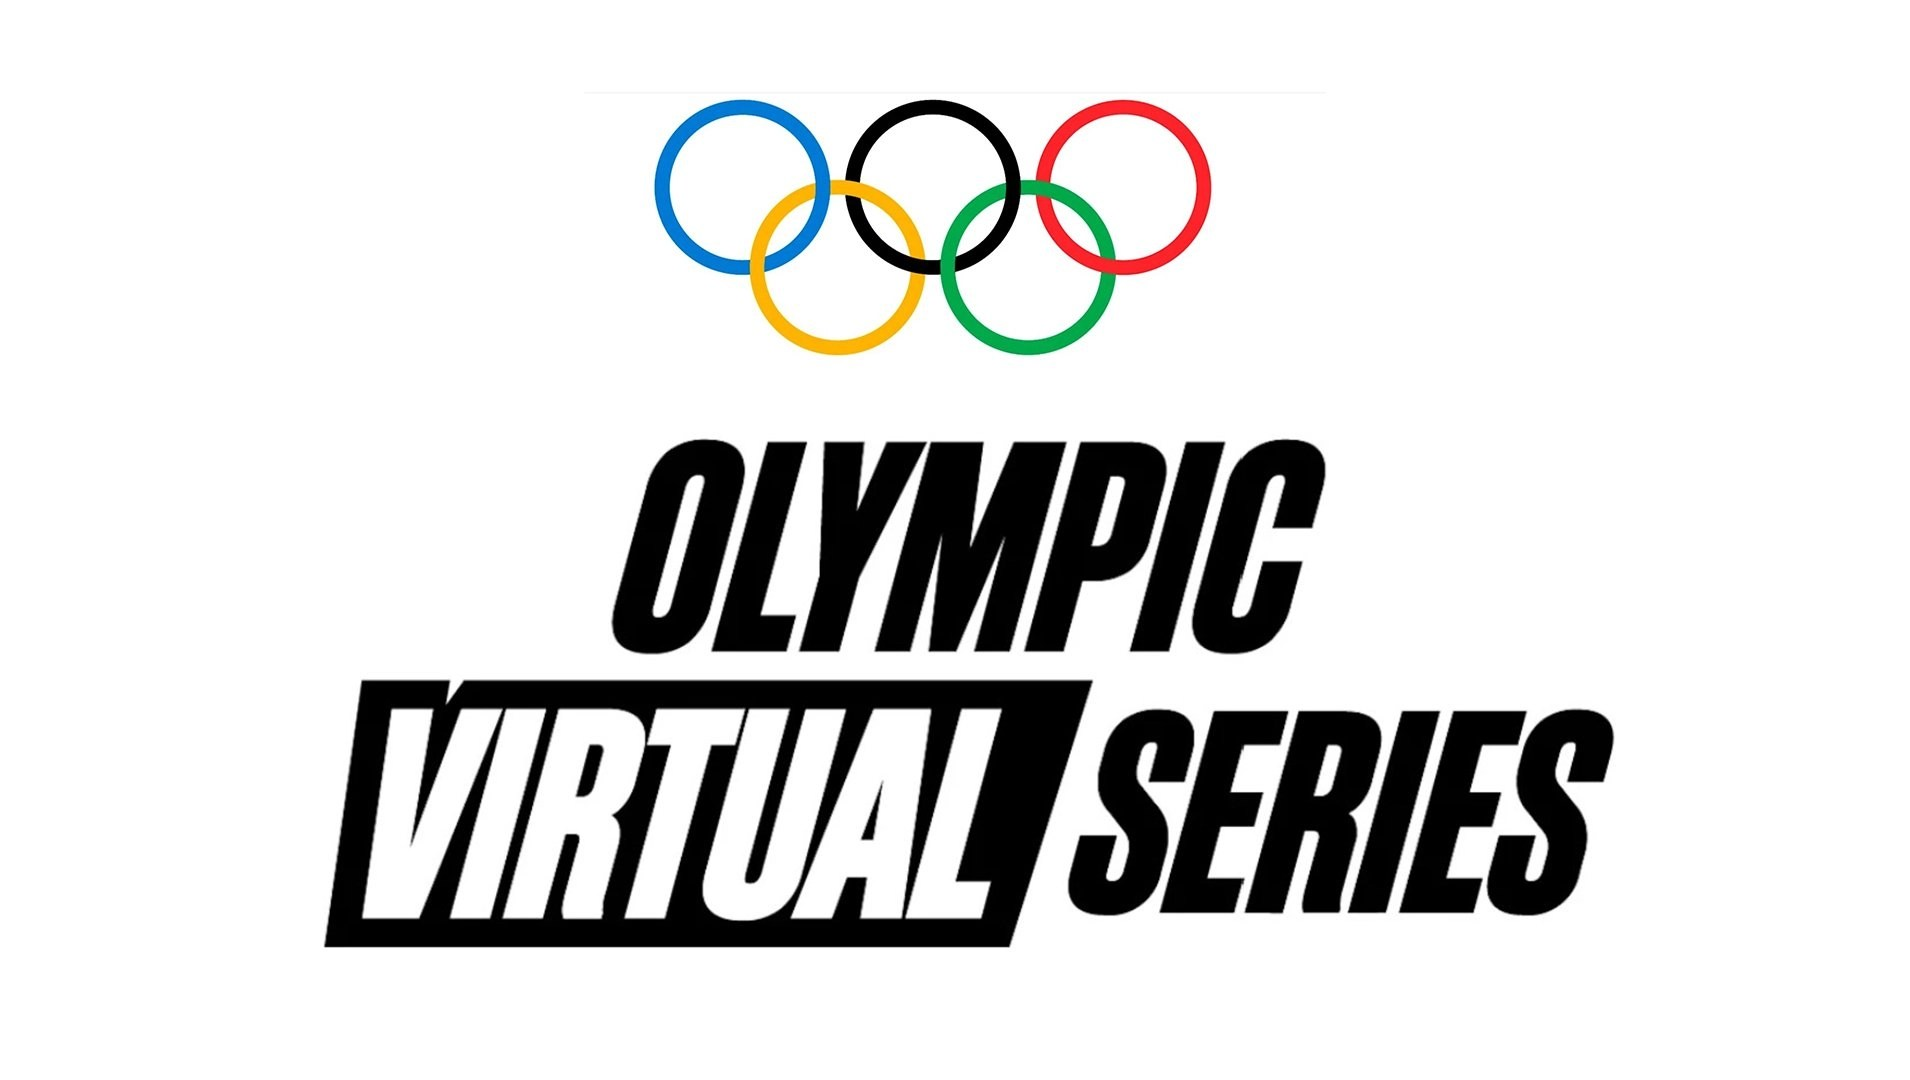 Olimpic Virtual Series